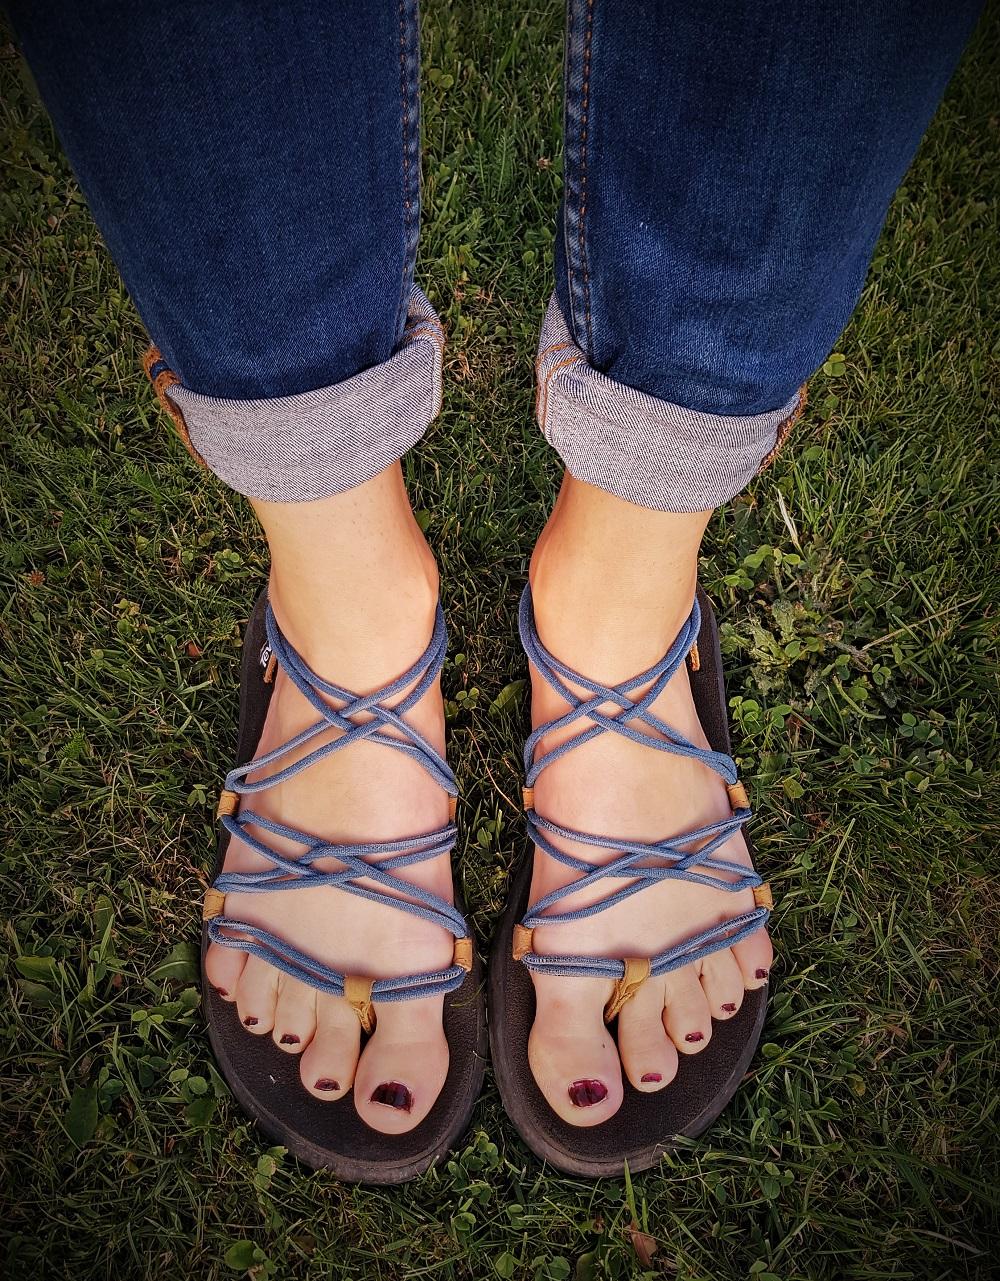 8b9588d2c23f Recenzja sandałów damskich Teva Voya Infinity